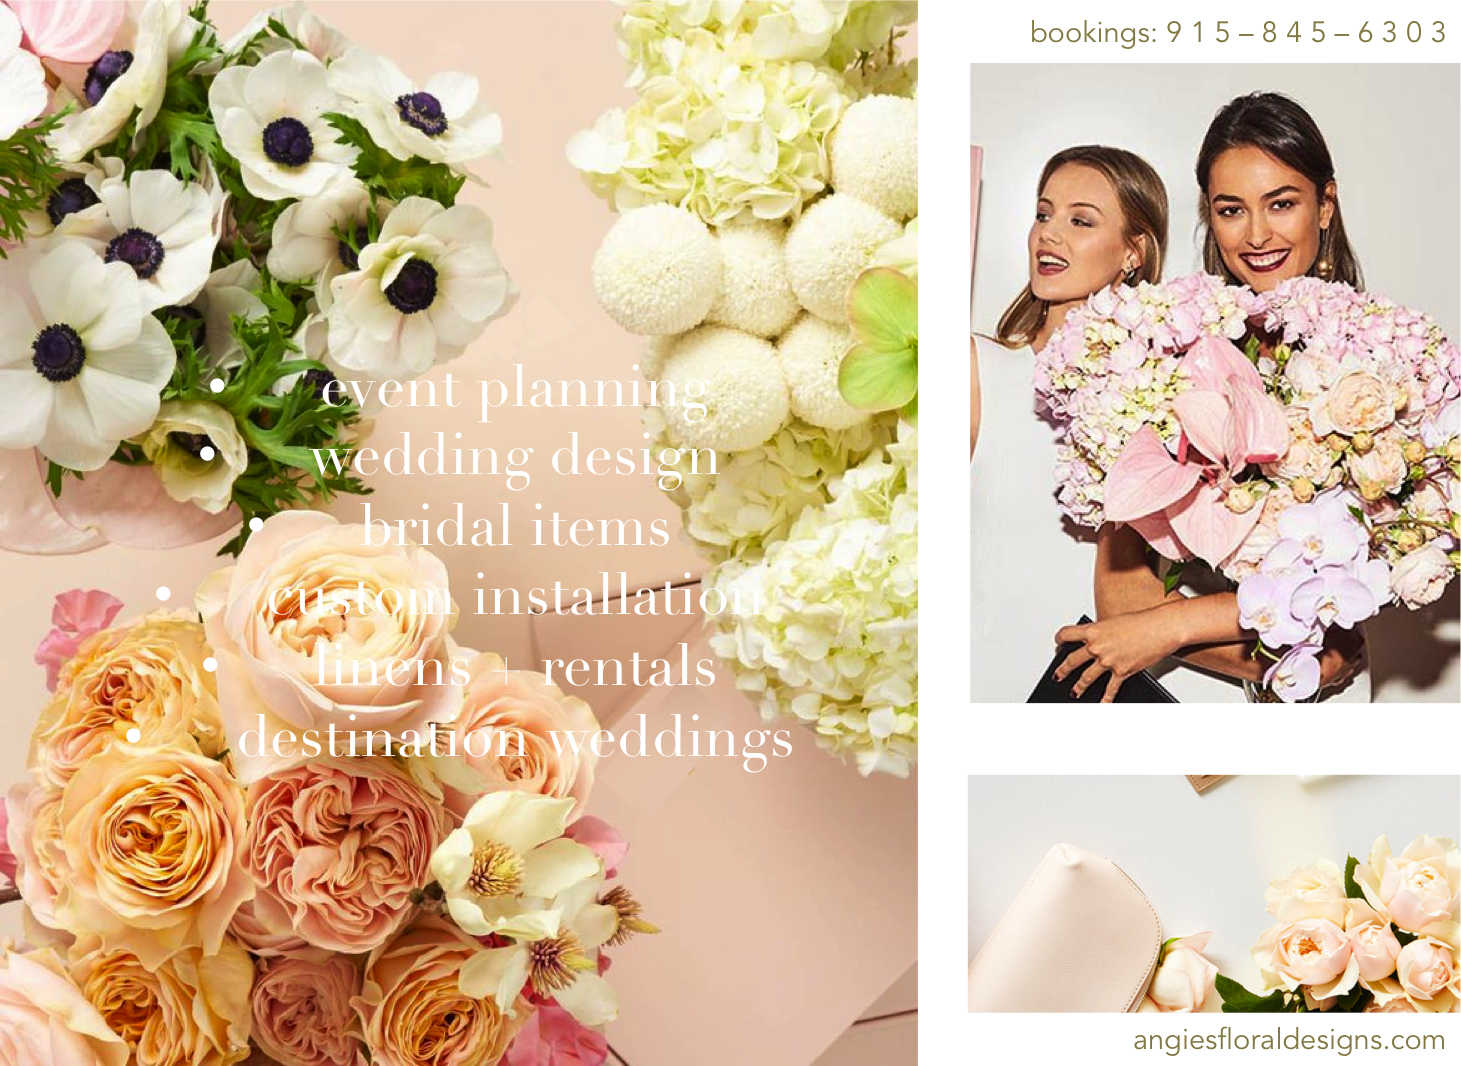 -.-a-gi-e-s-e-v-ent-el-paso-florist-flowers-l-angies-flowers-angie-s-floral-designs-el-paso-business-accounts-floral-designs-plants-gifts-shopflores-online-el-paso-texas-florist-flower-delivery-weddings-events-79912.png